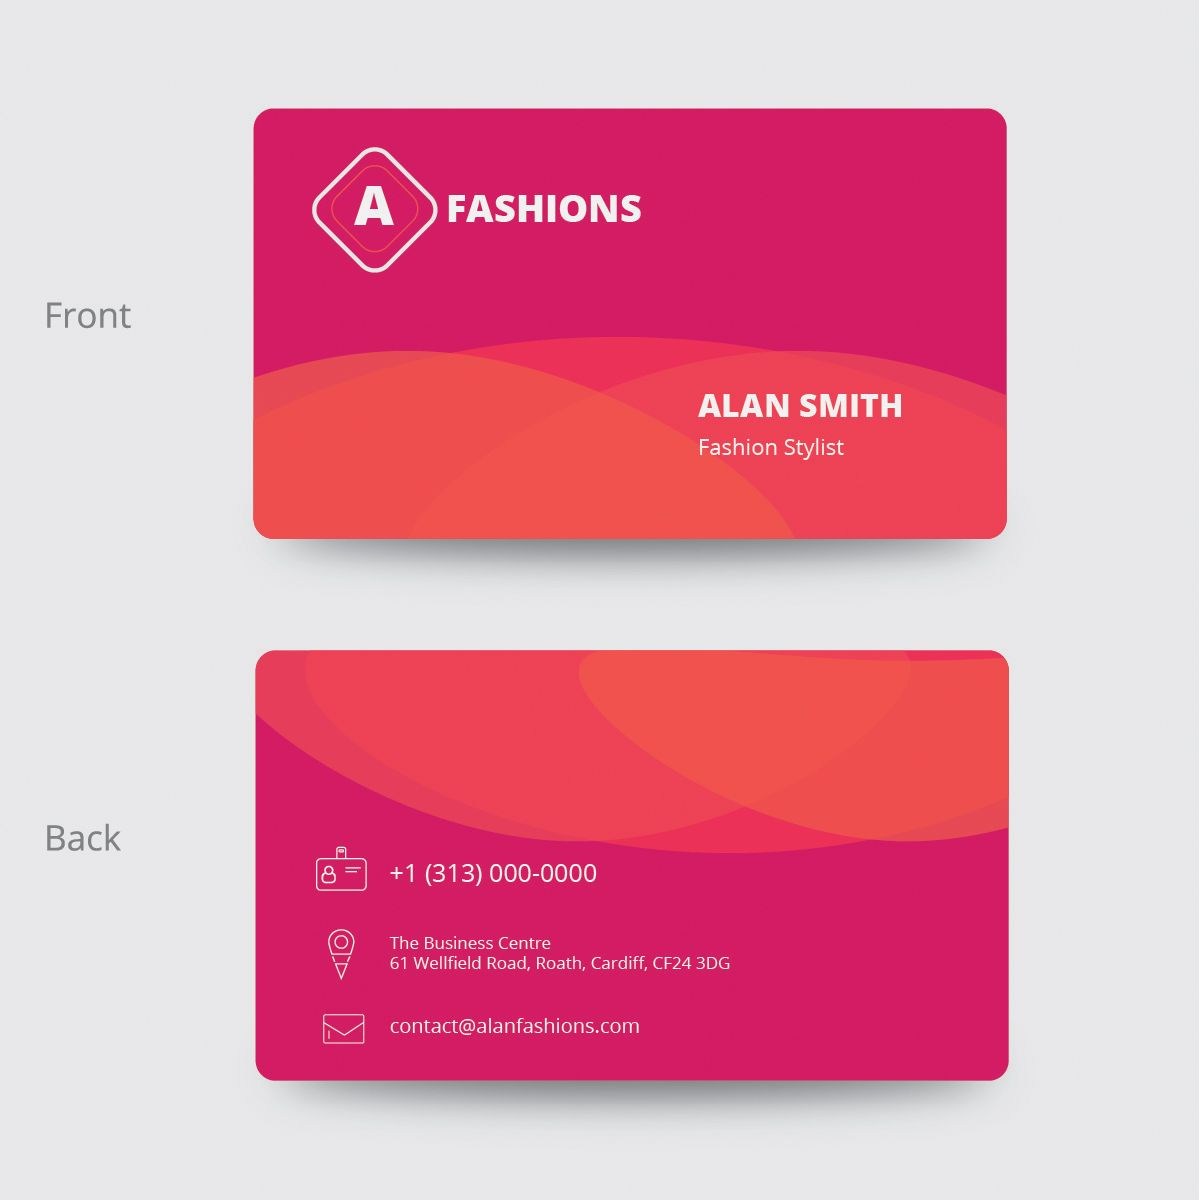 Fashion Business Card Design Fashion Business Cards Business Card Design Card Design